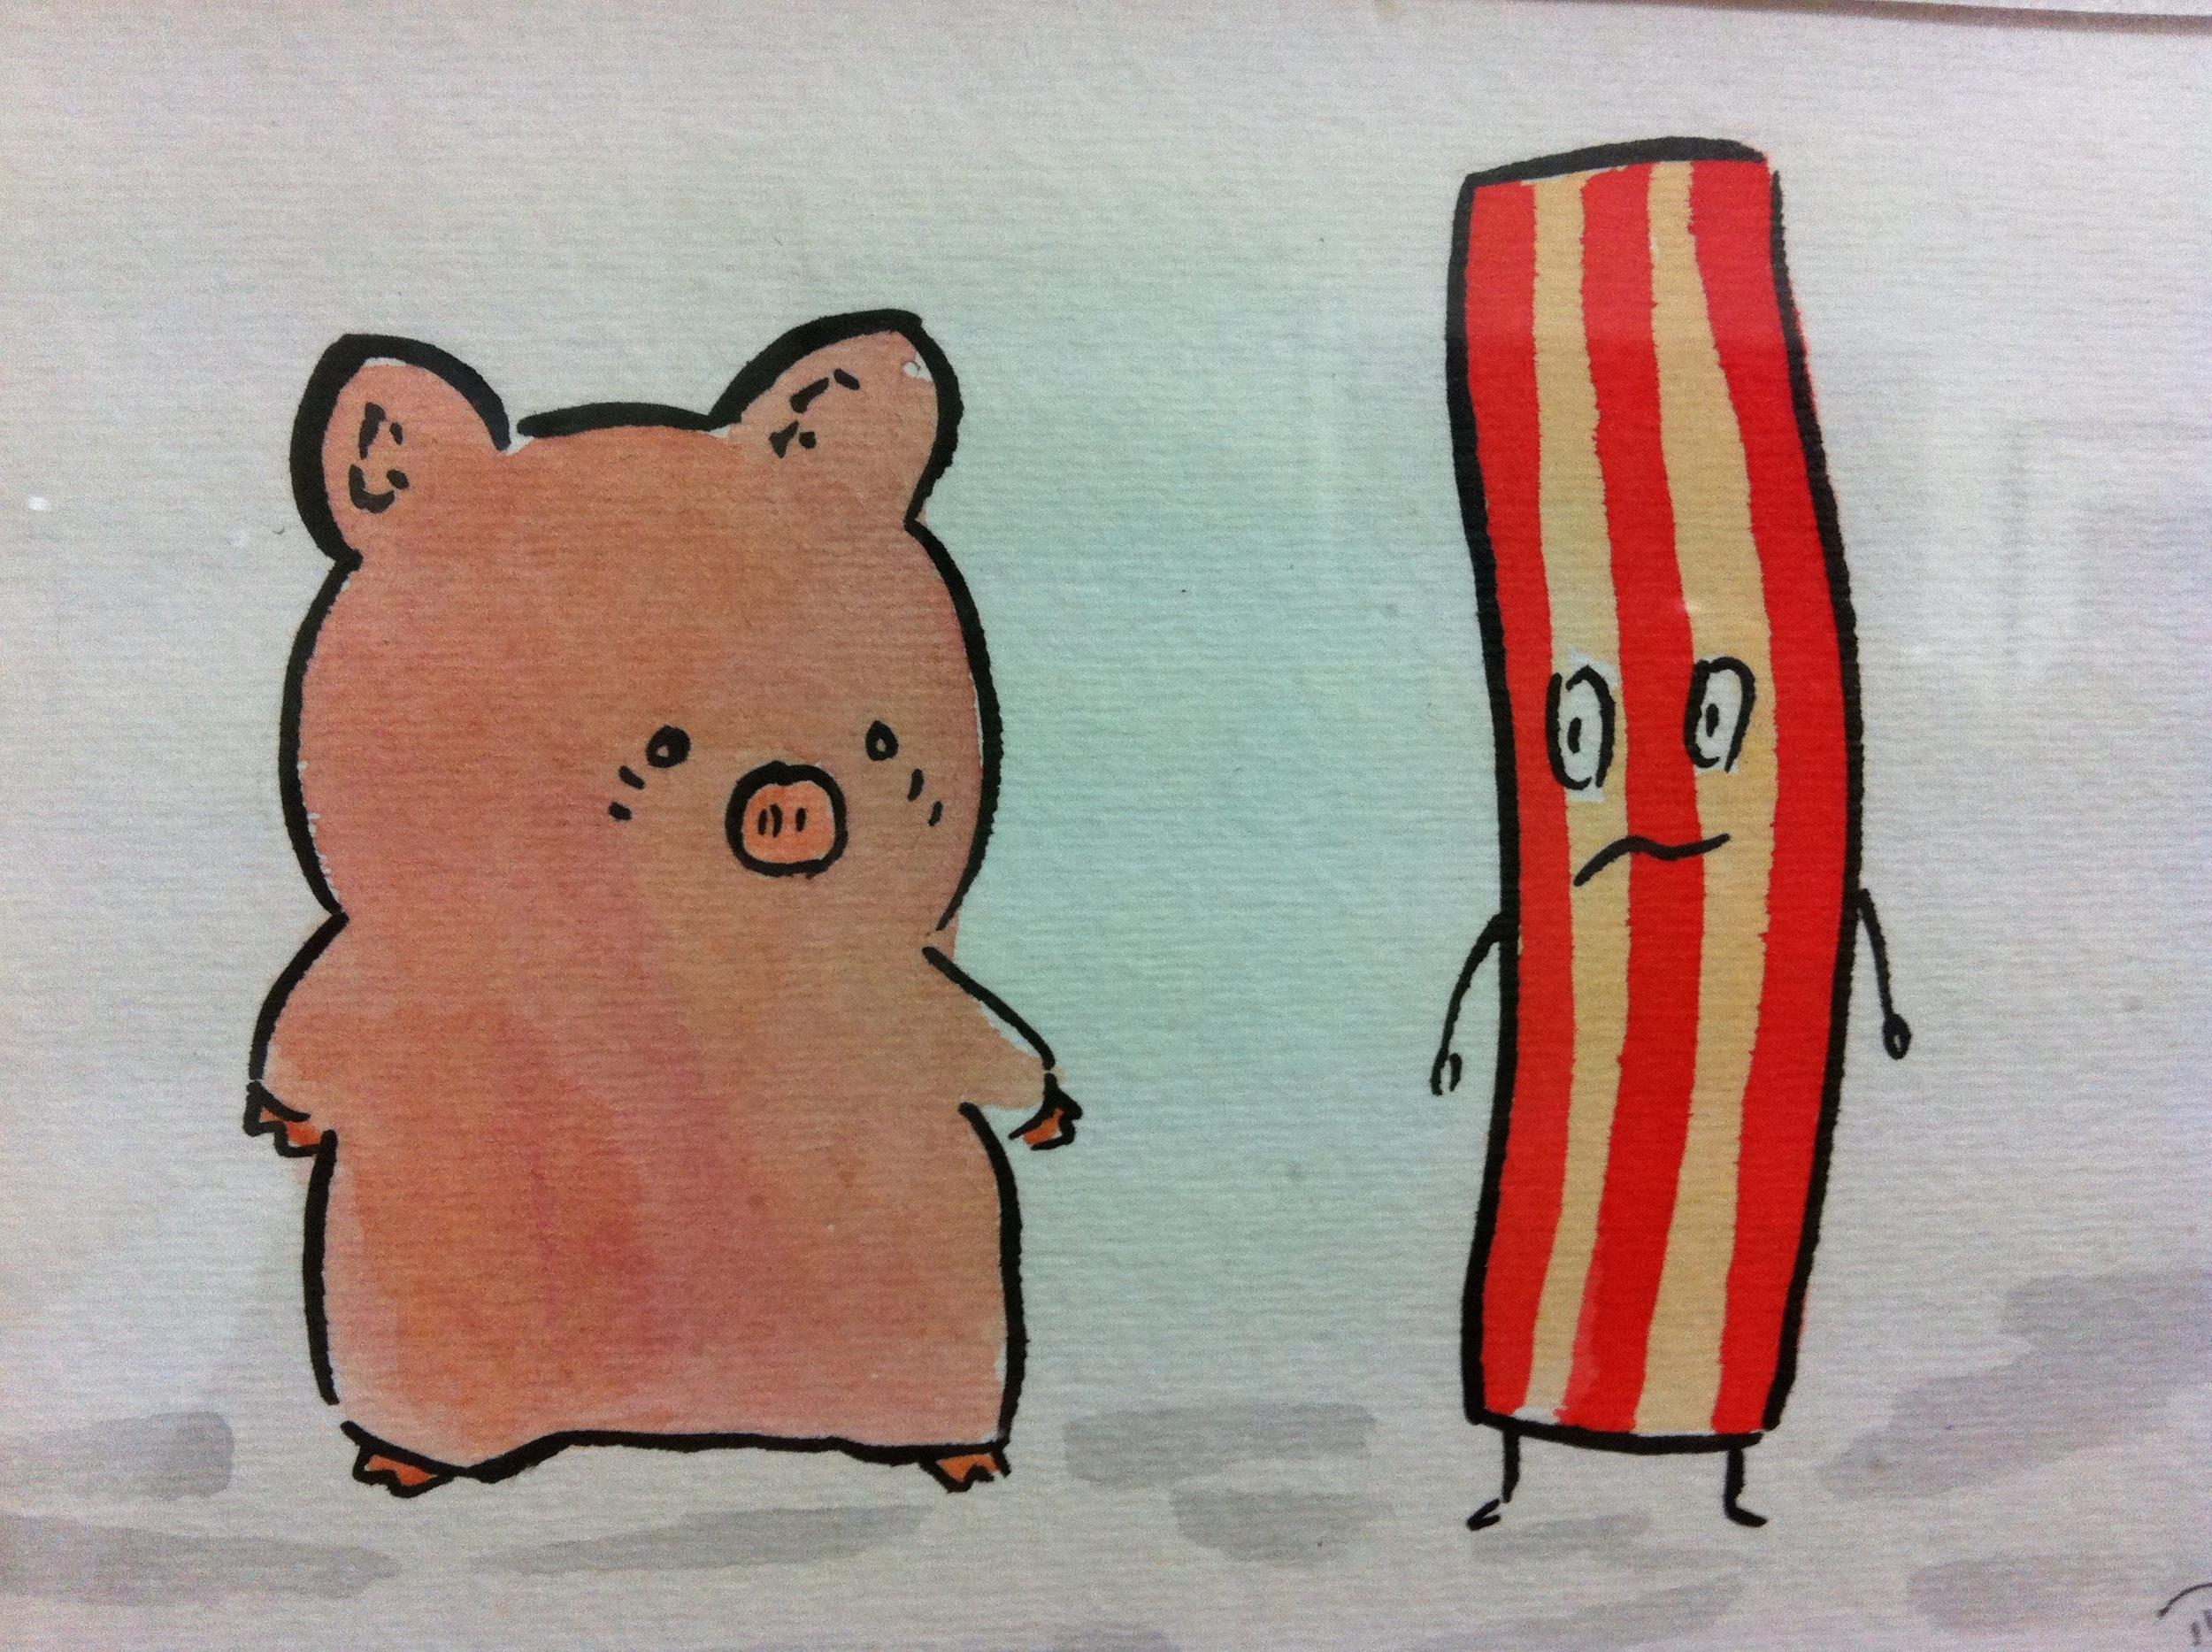 Zashikibuta Meets Shaky Bacon, Dan Goodsell